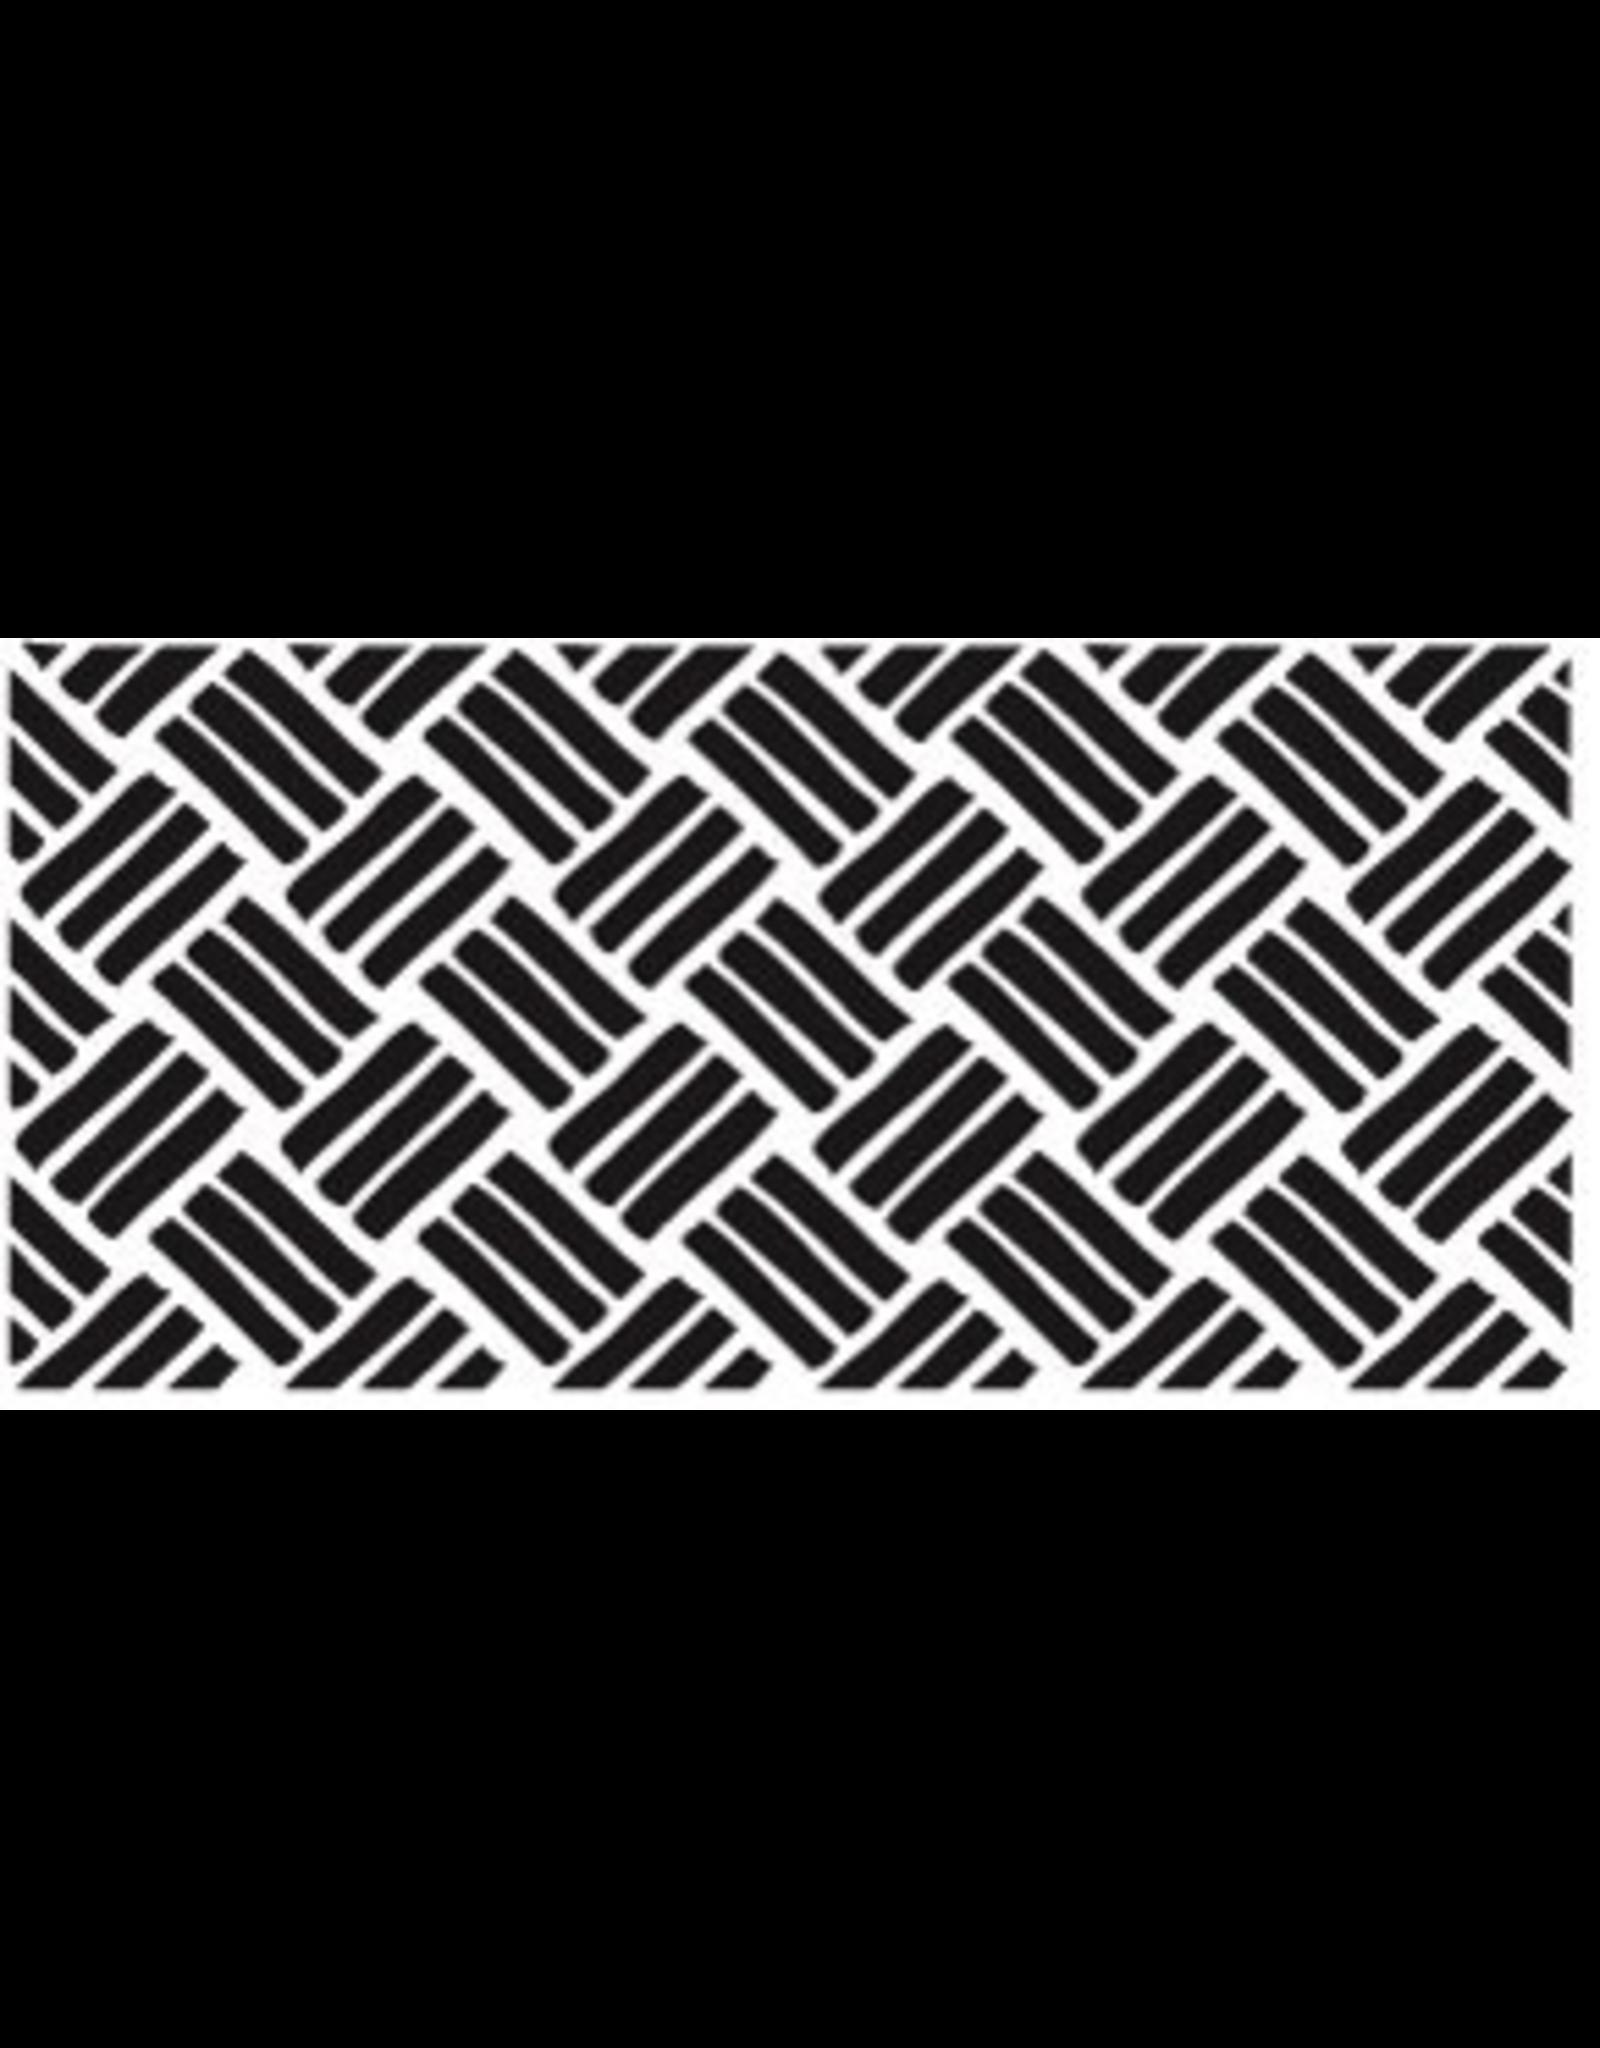 MKM tools Diagonal square weave Handroller